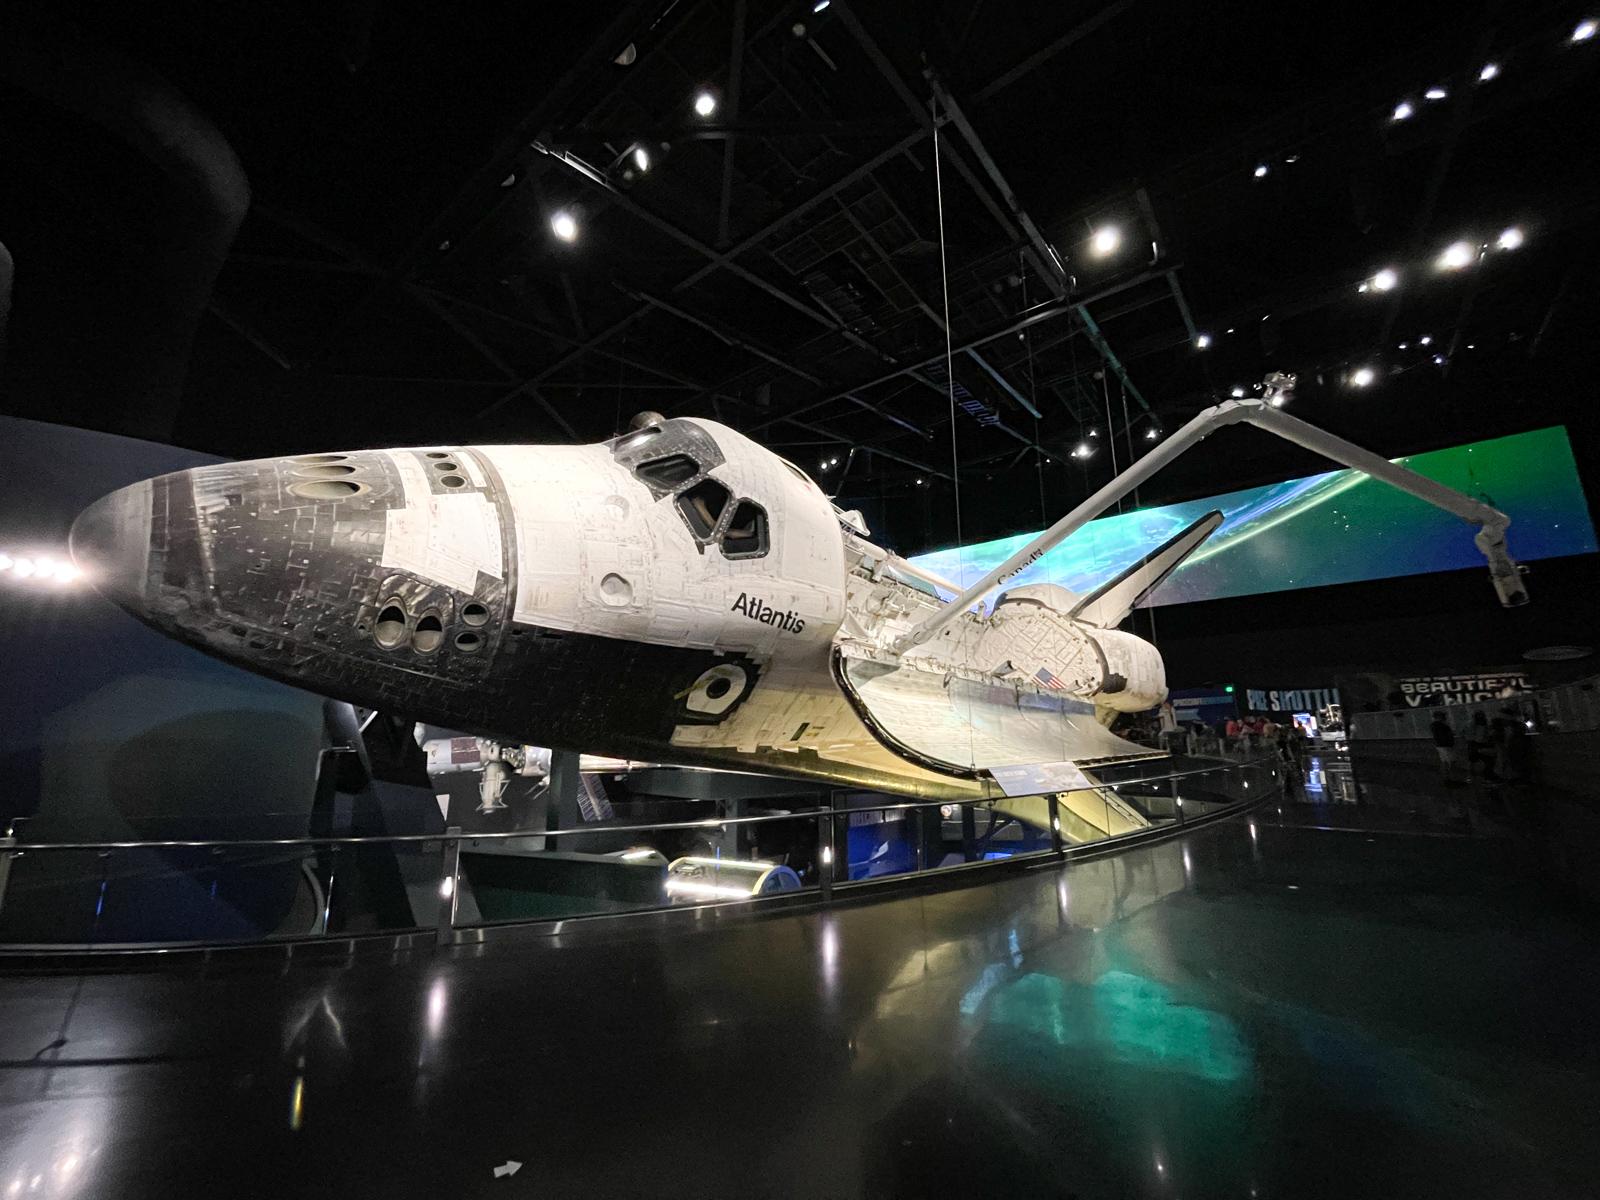 Atlantis shuttle with robotic arm